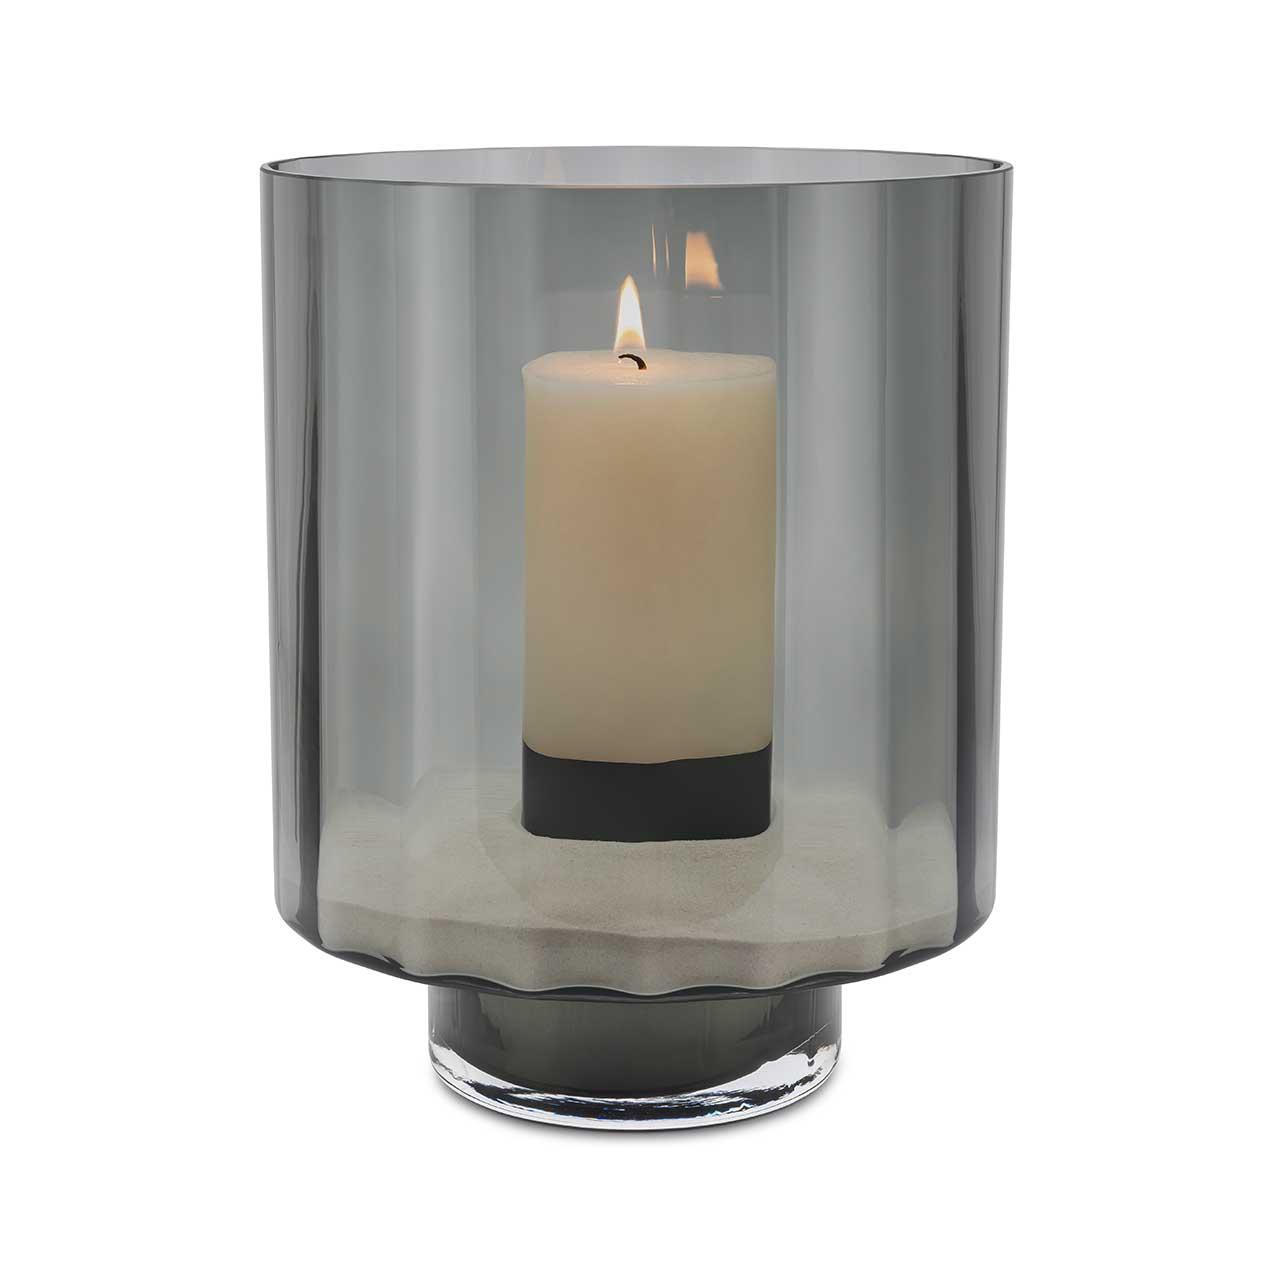 ABHIKA Vase Spin, H35 D28, Grey